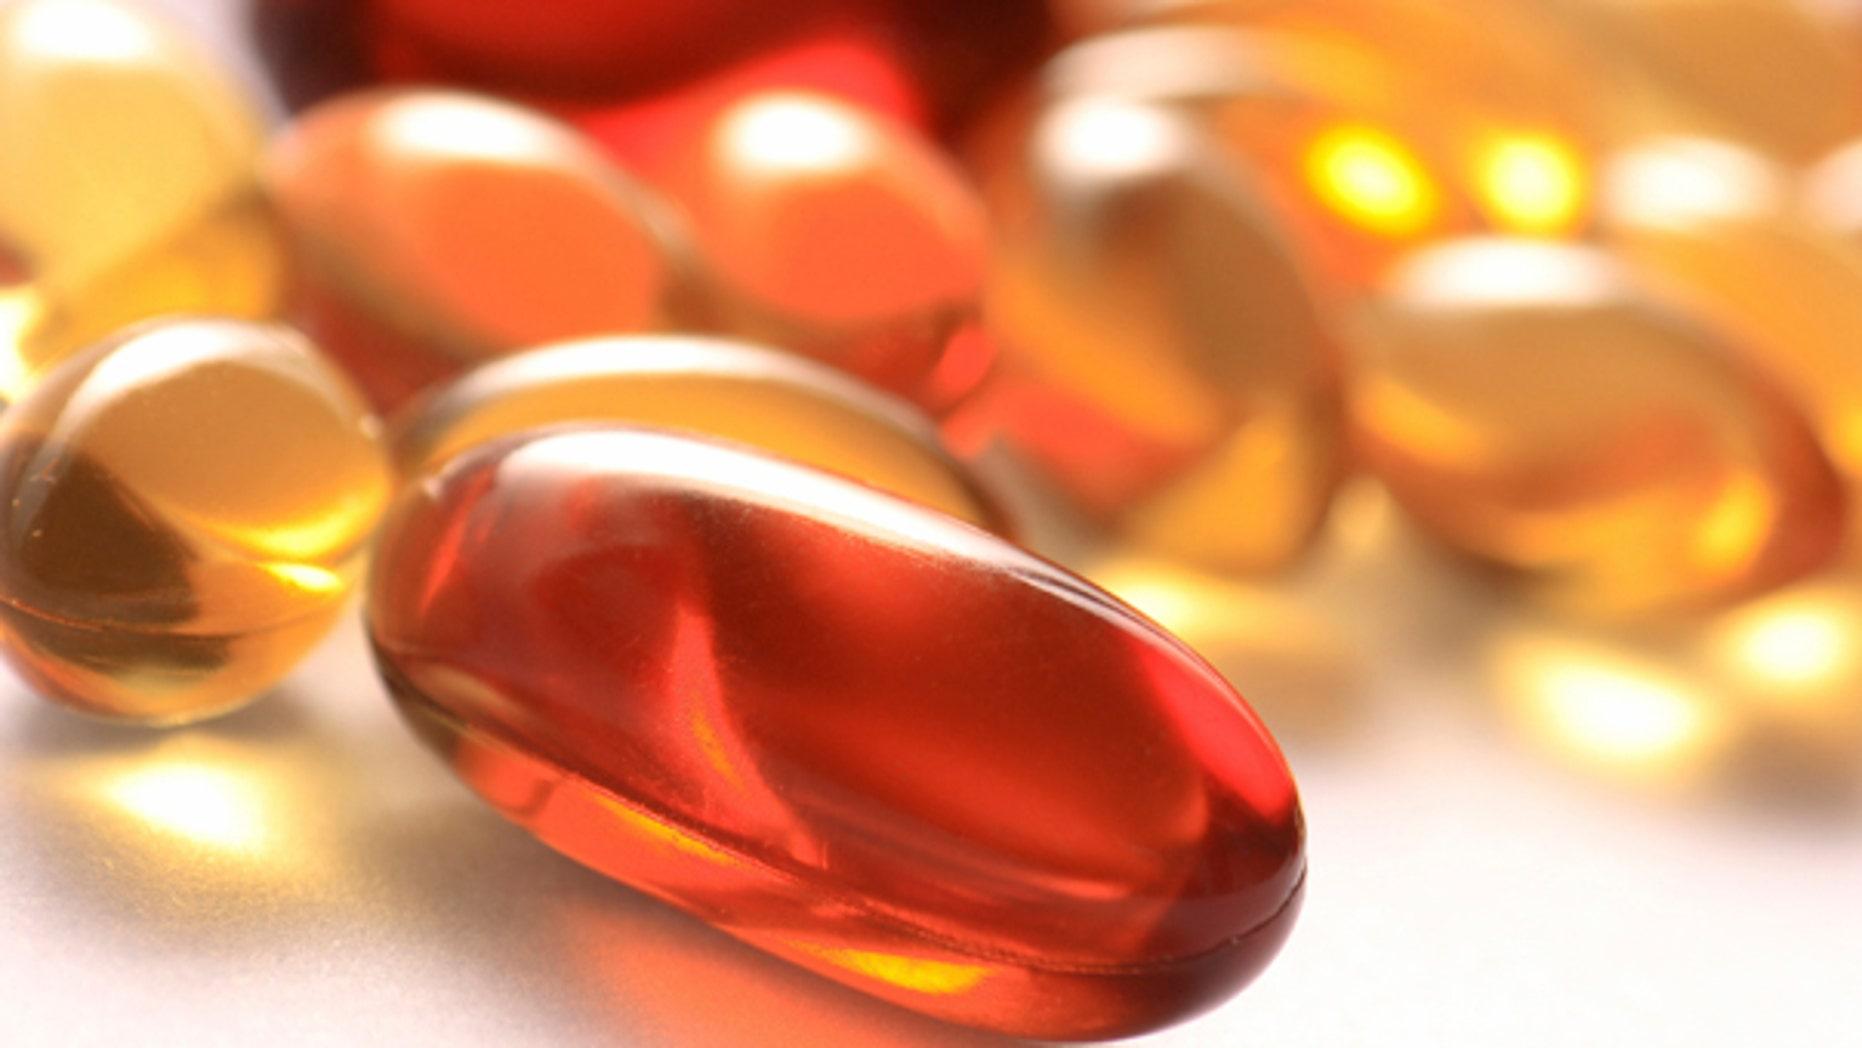 Vitamin D Supplements May Help Ease Fibromyalgia Pain: Study photo